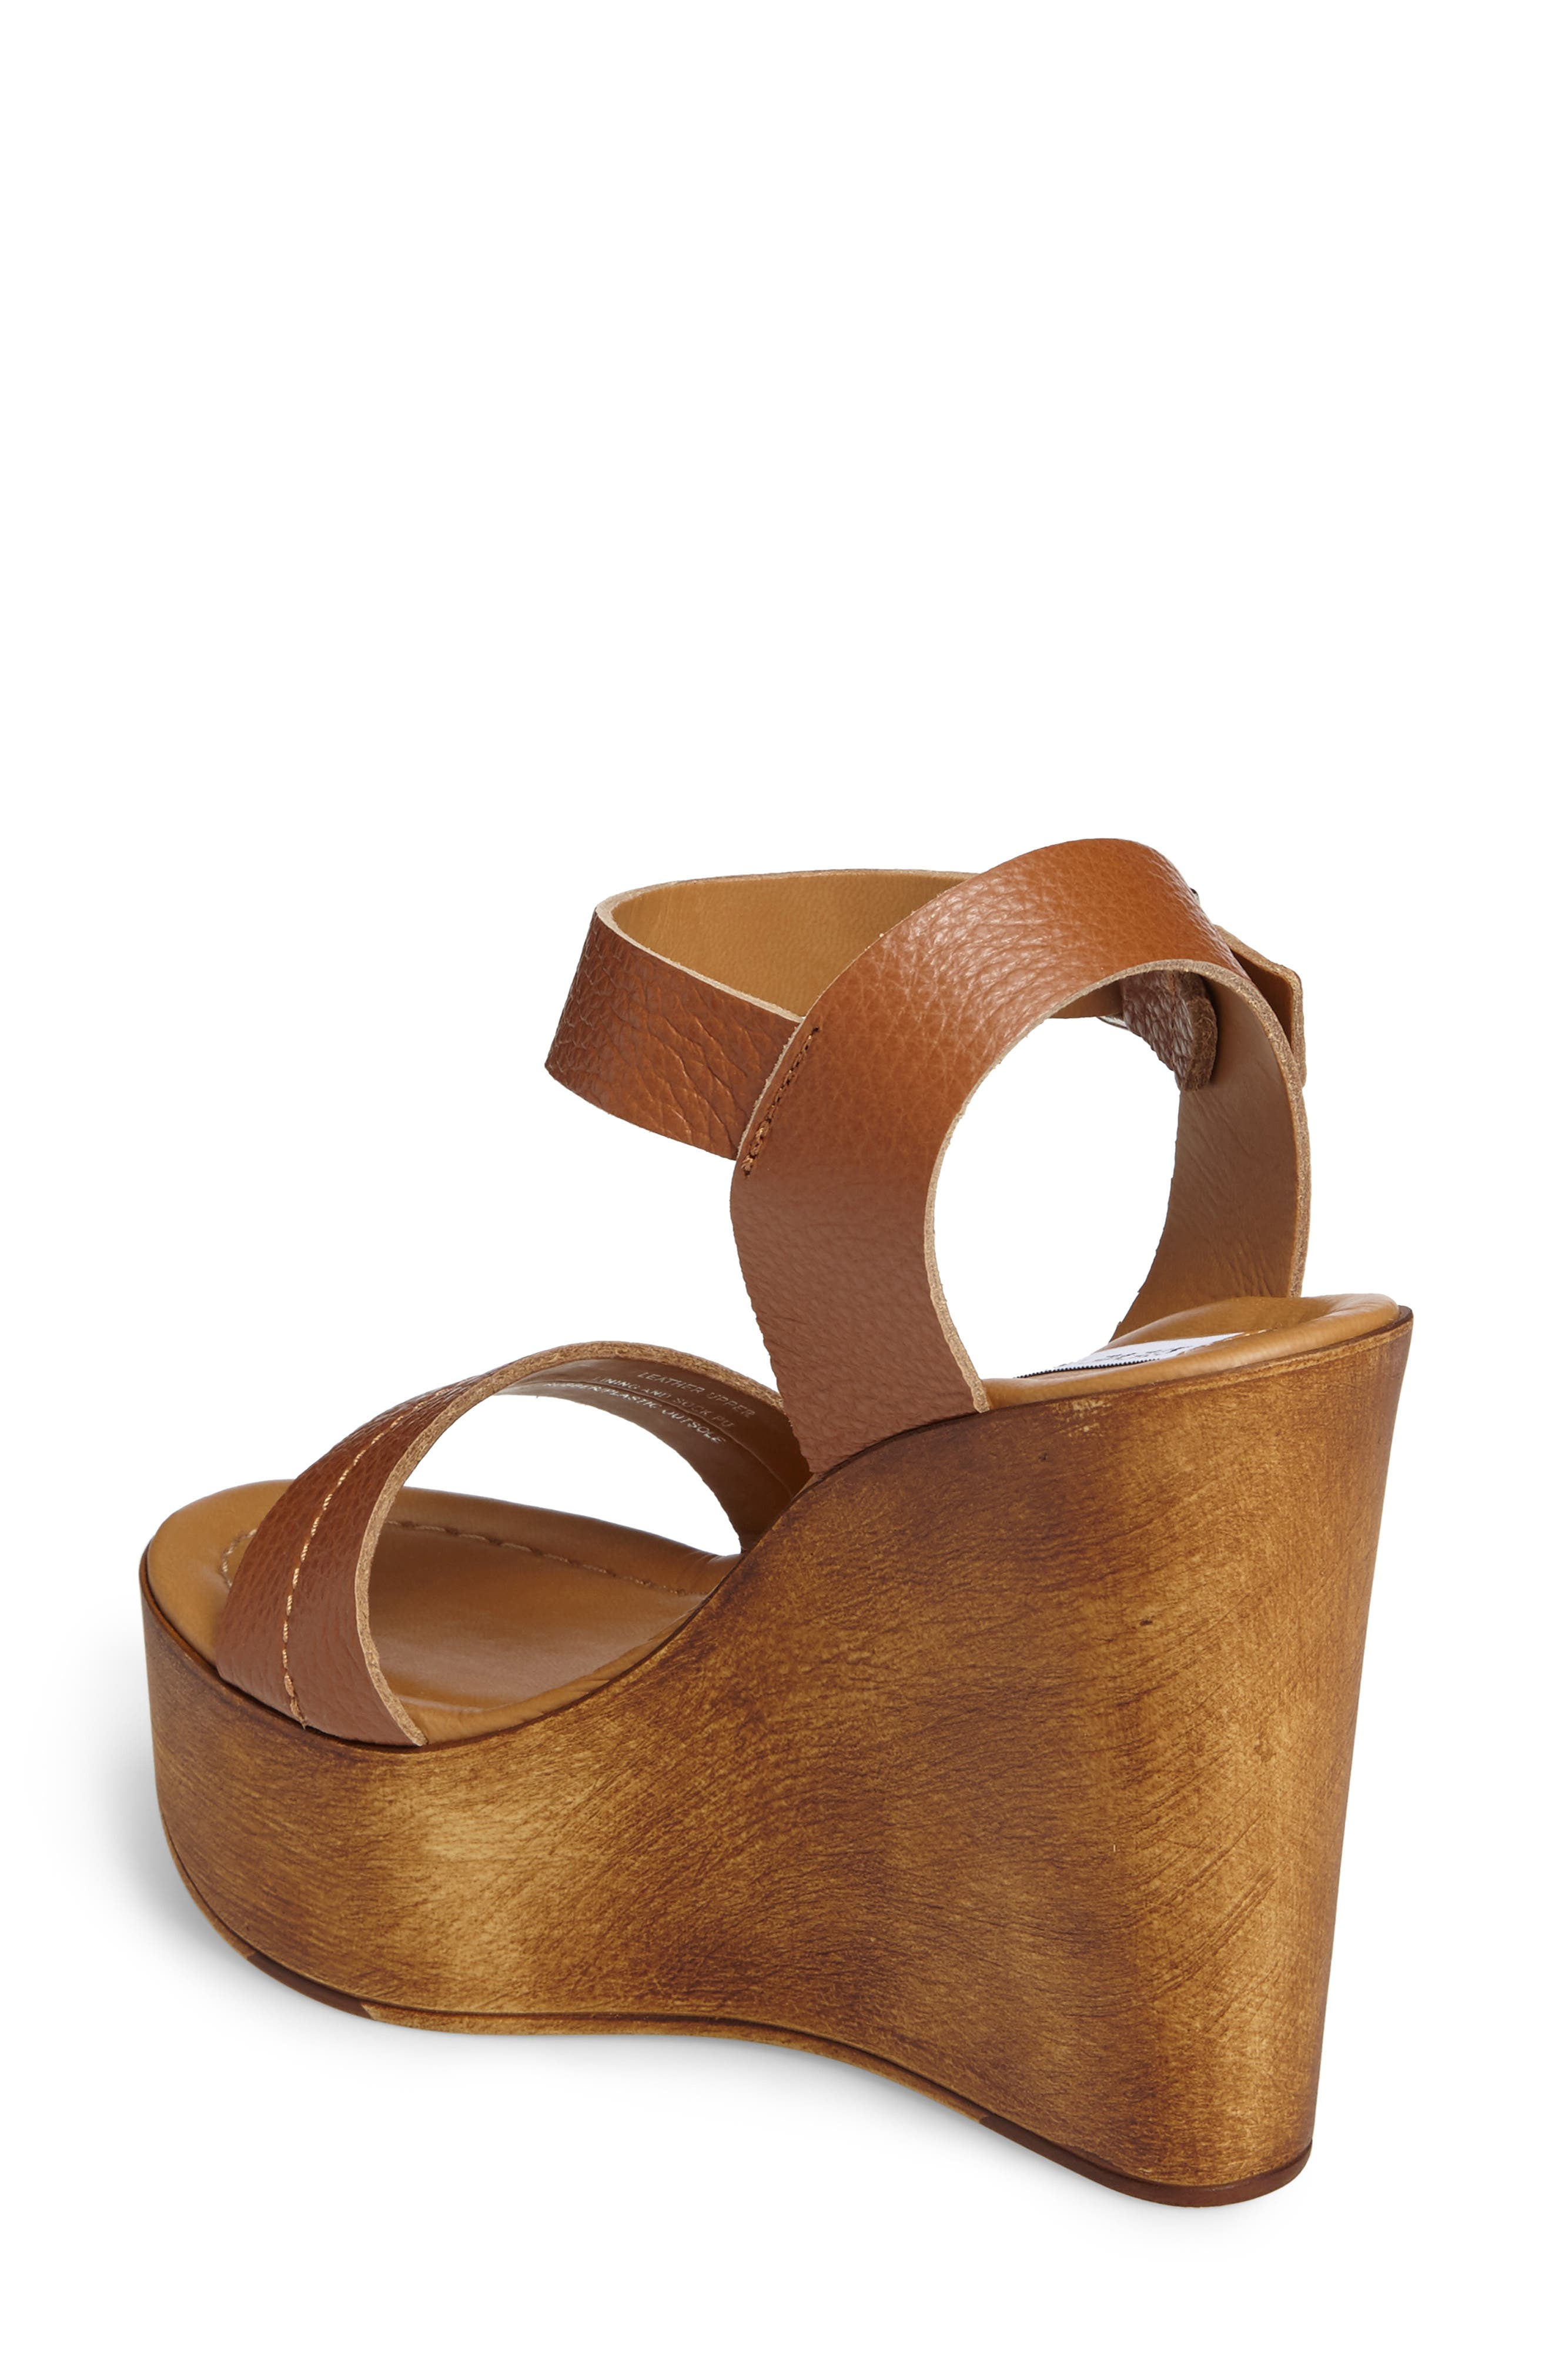 Belma Wedge Sandal,                             Alternate thumbnail 6, color,